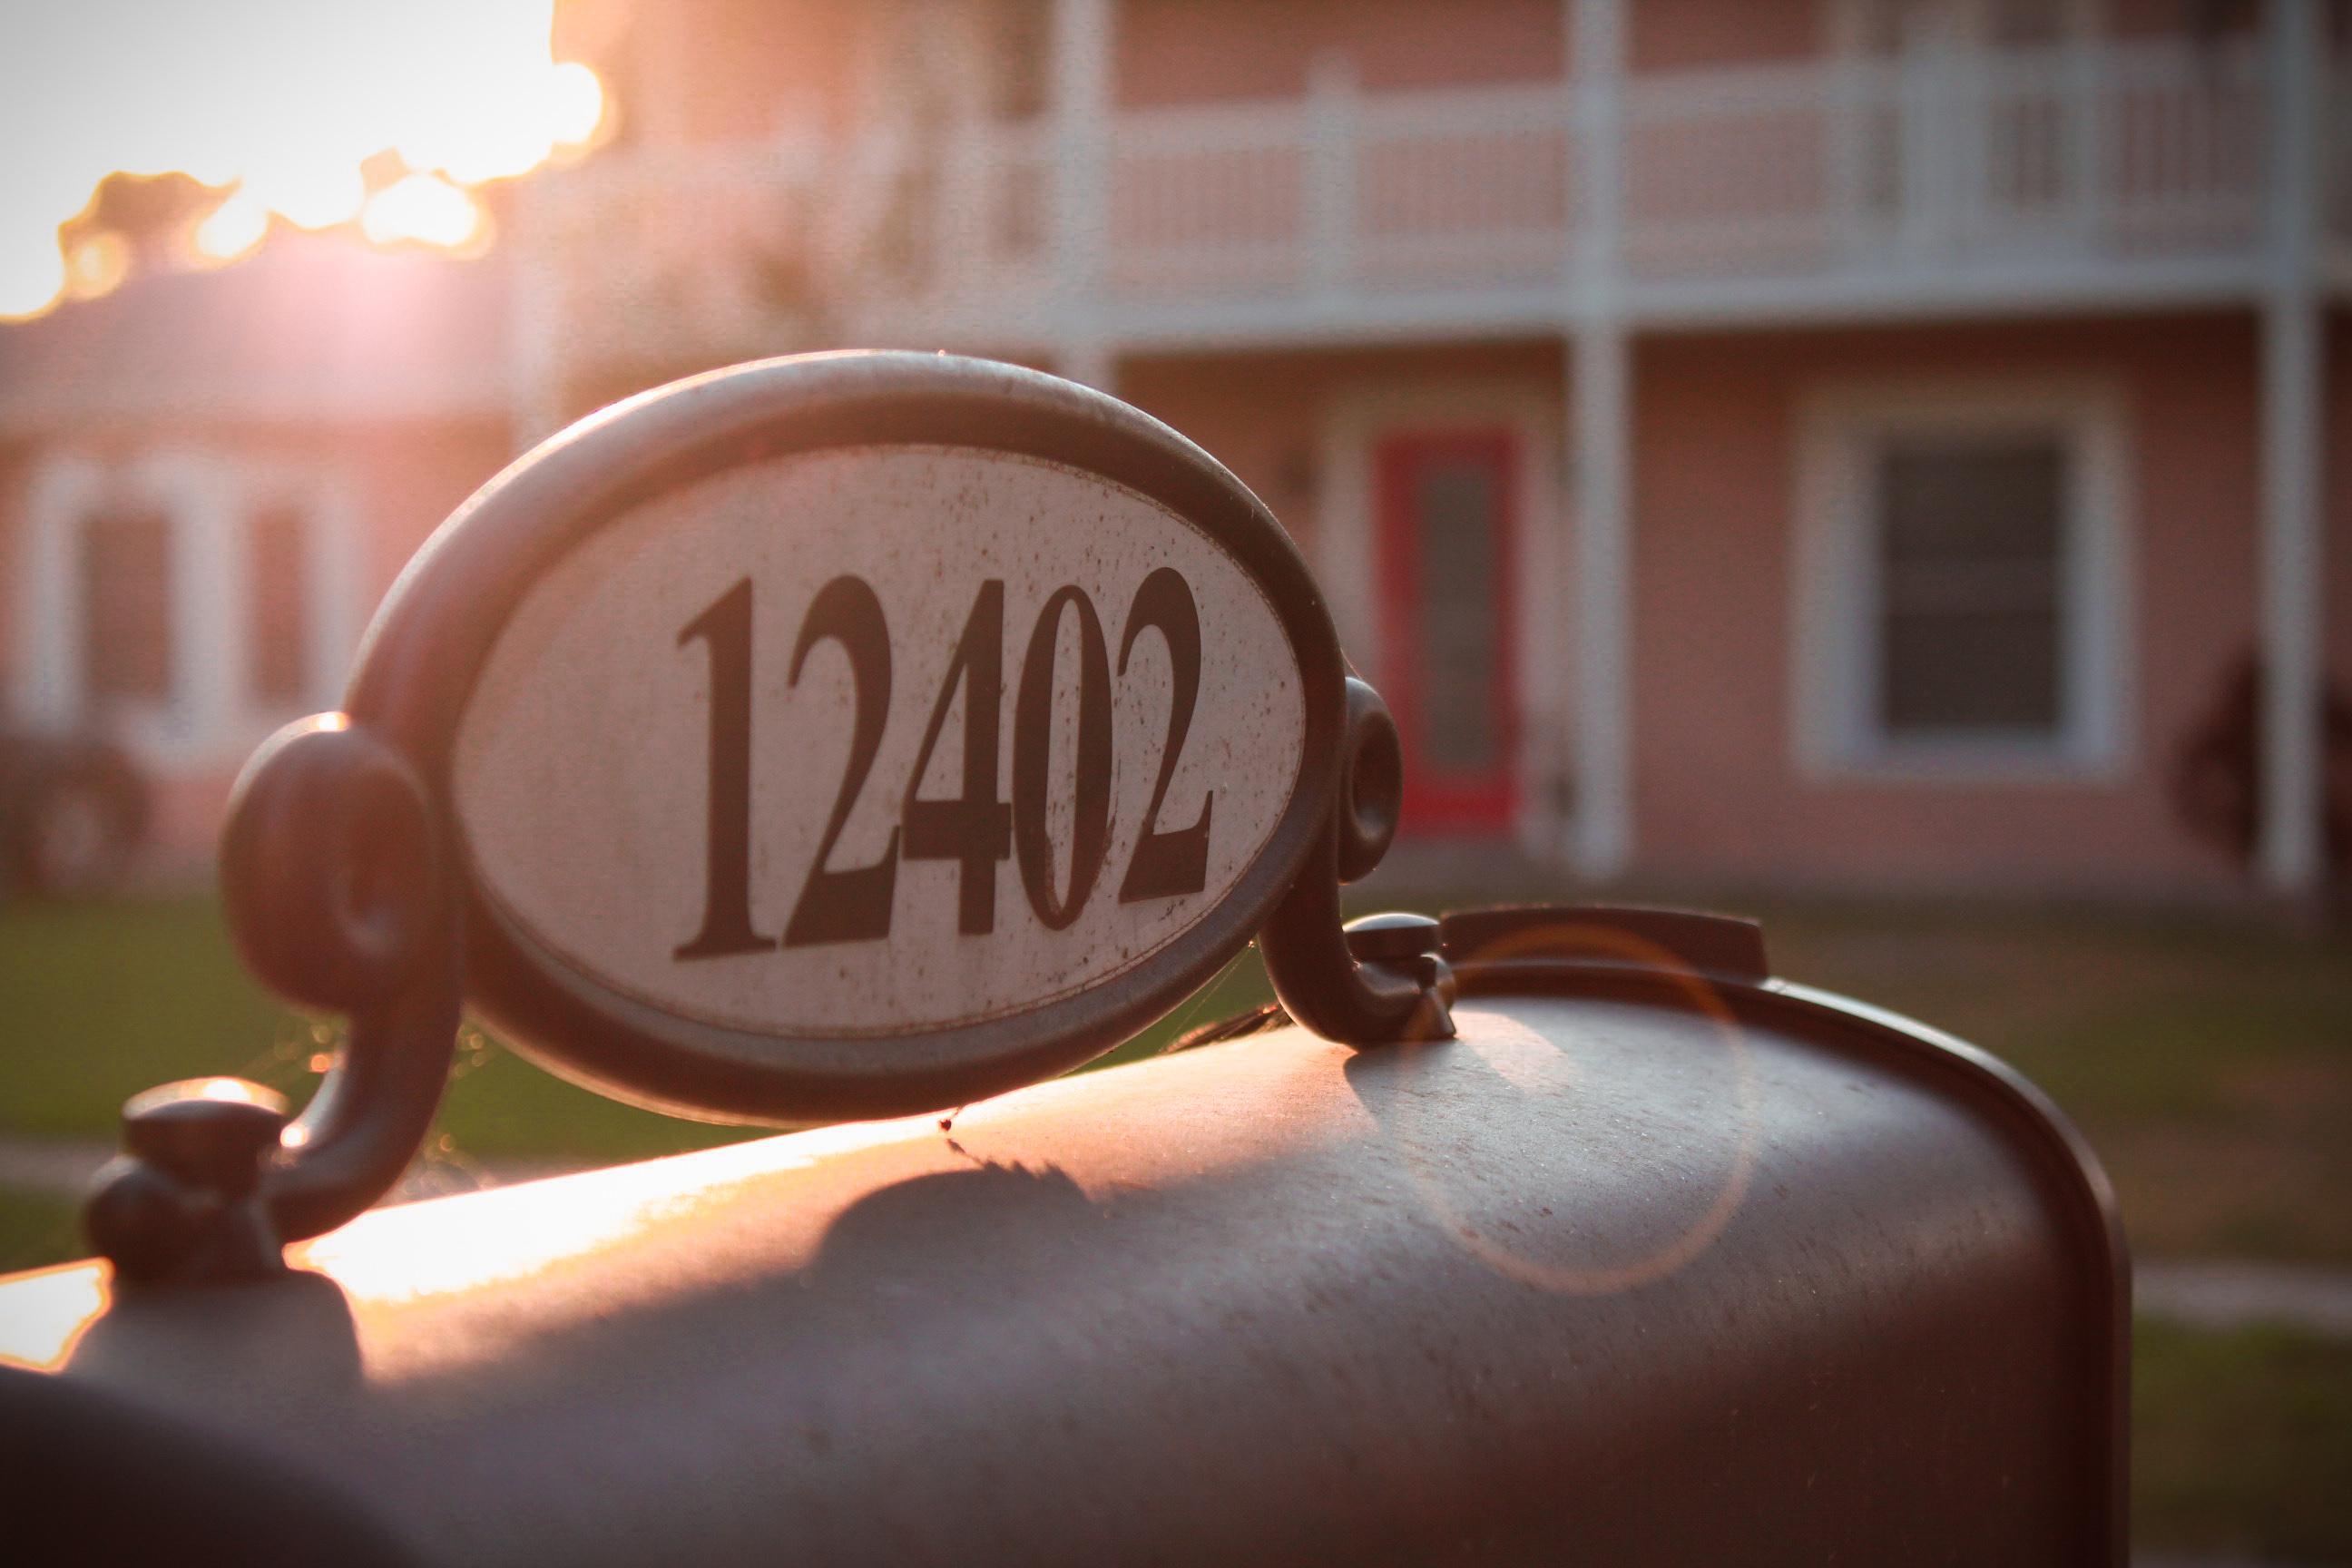 12402 Mailbox during Sunrise